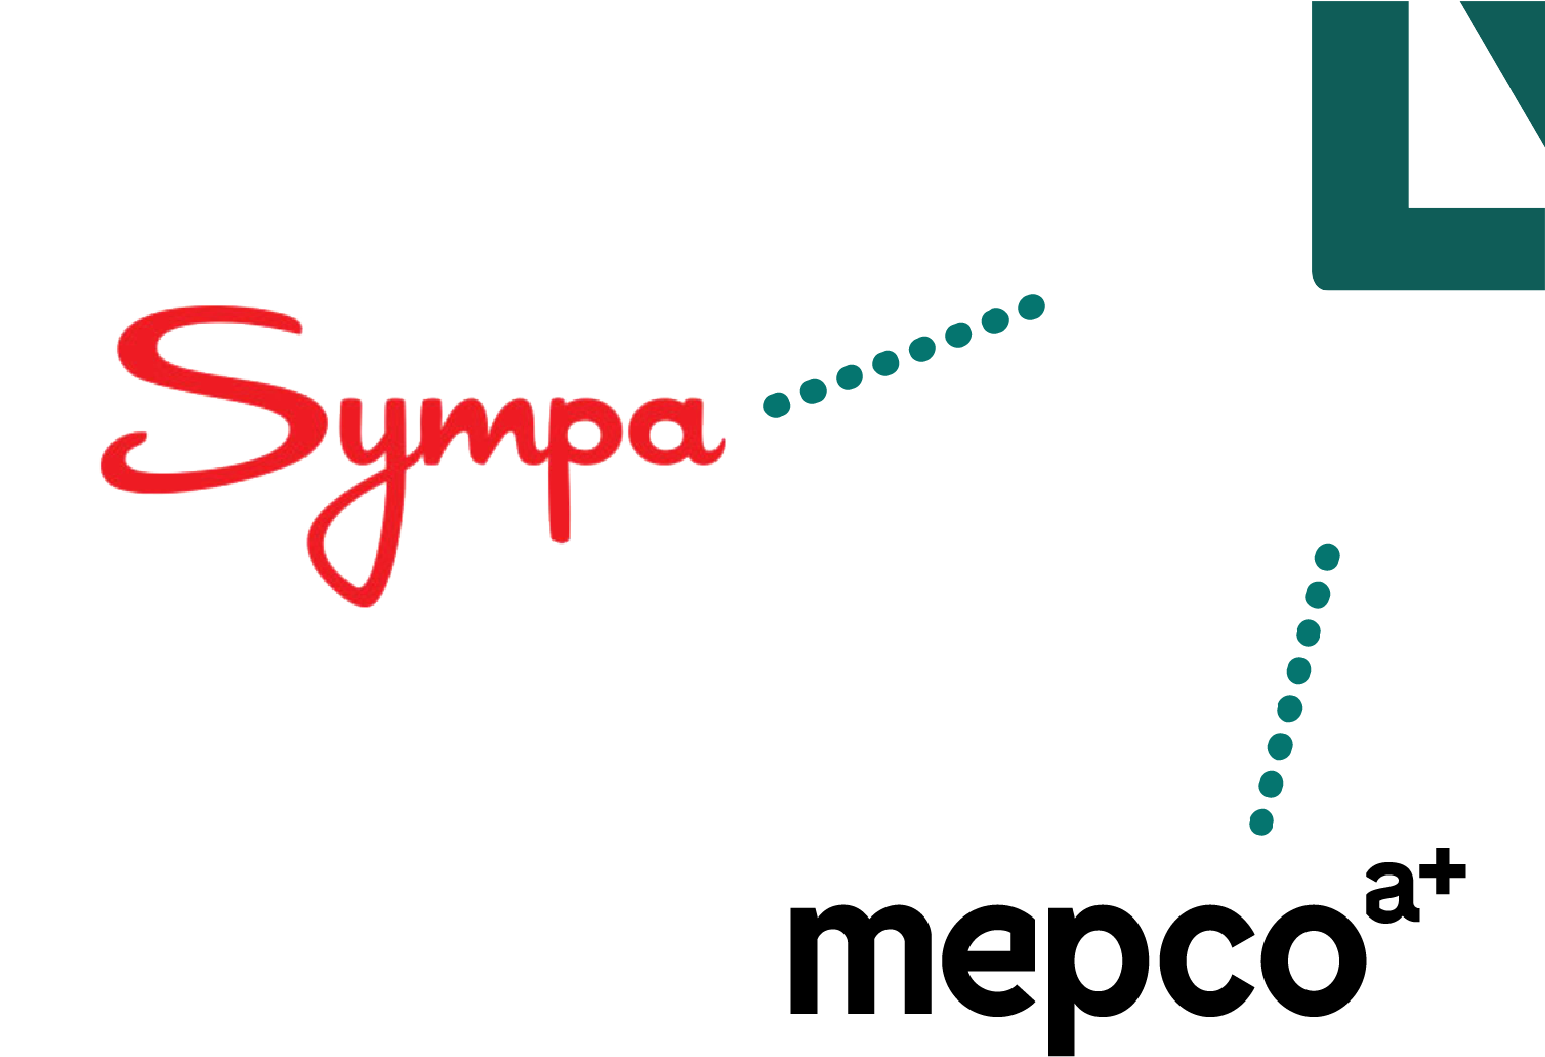 Lyyti Sympa, Mepco integration